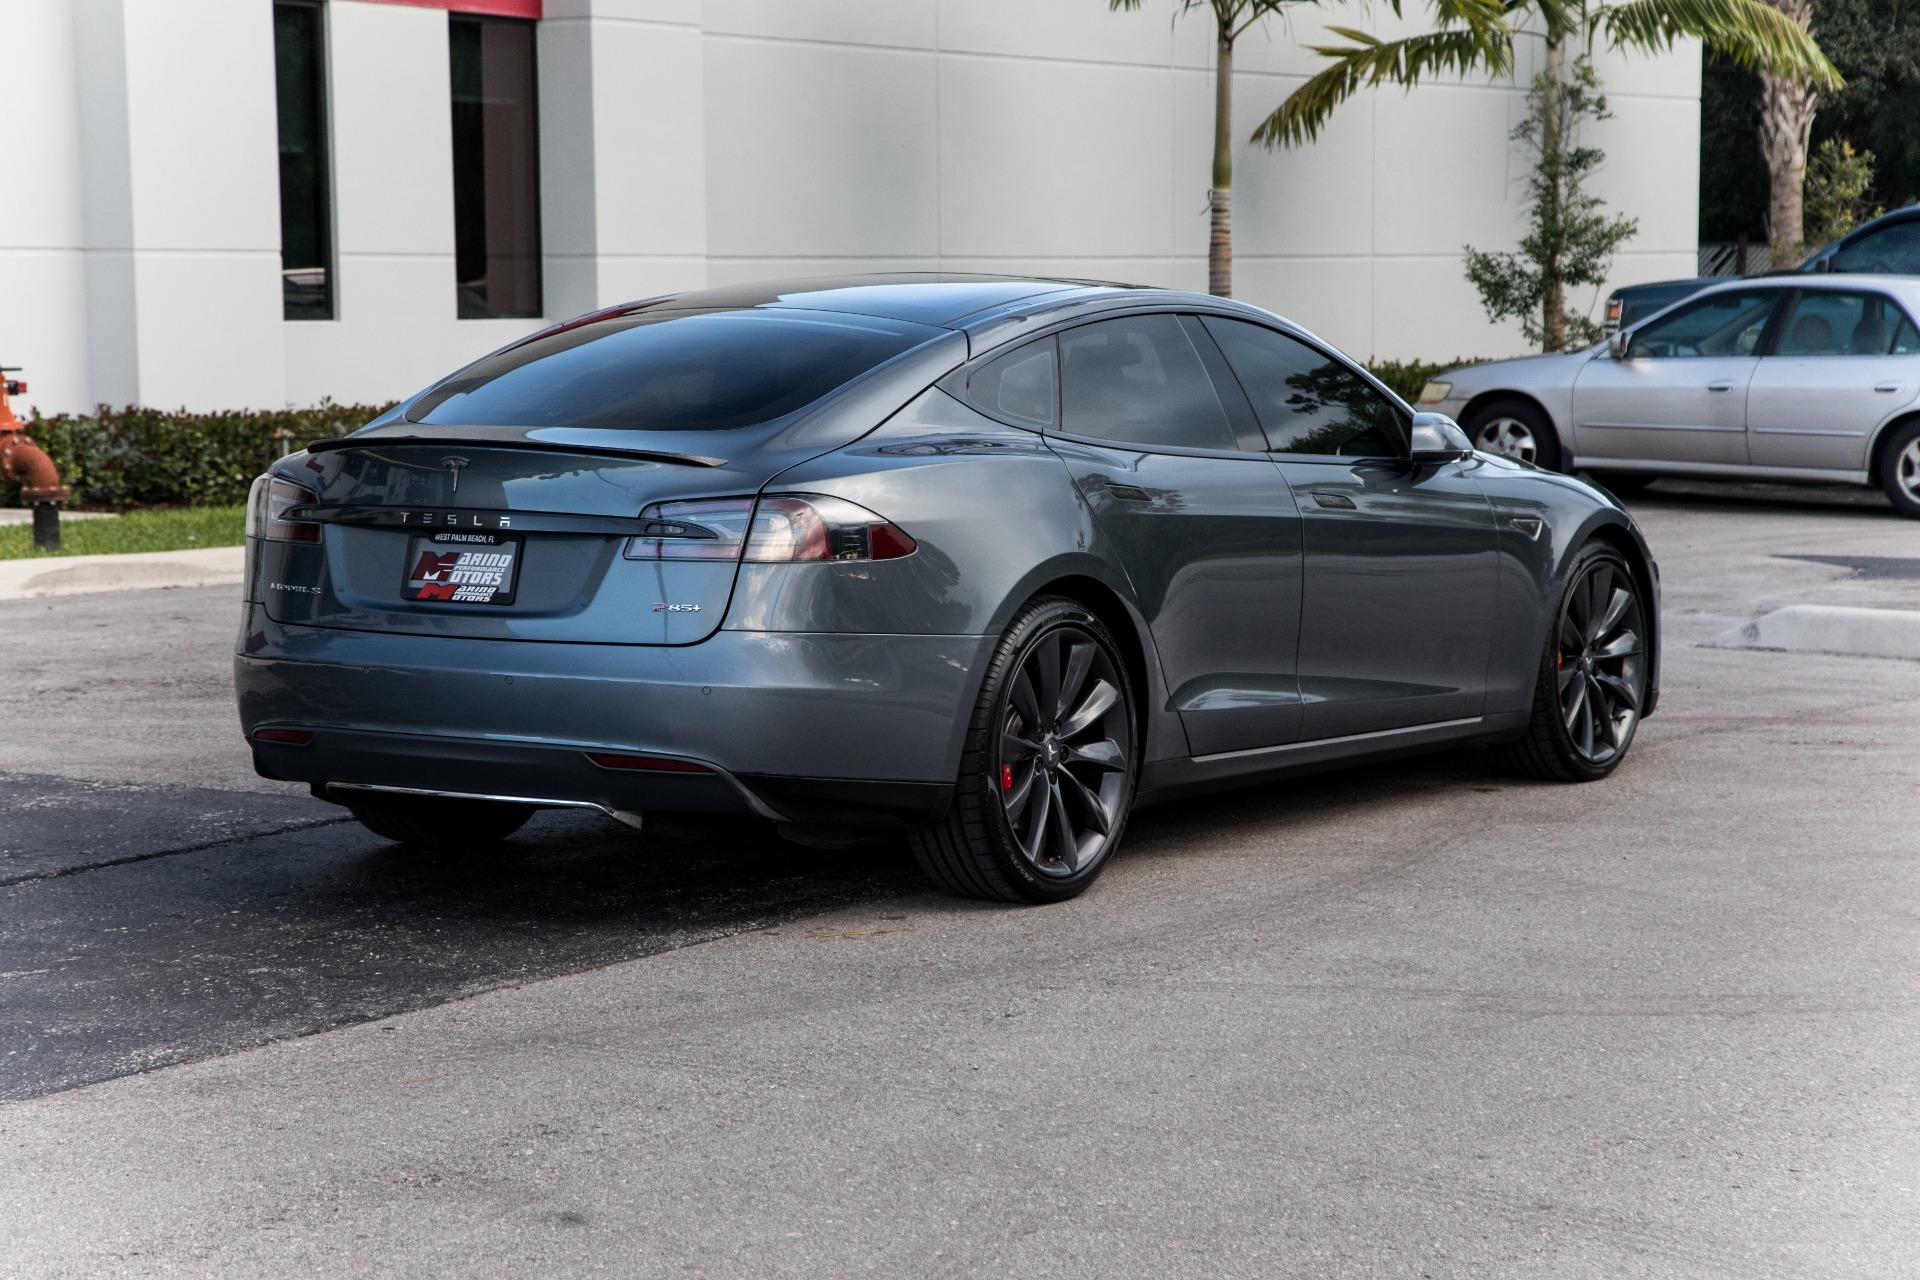 Used-2014-Tesla-Model-S-P85+